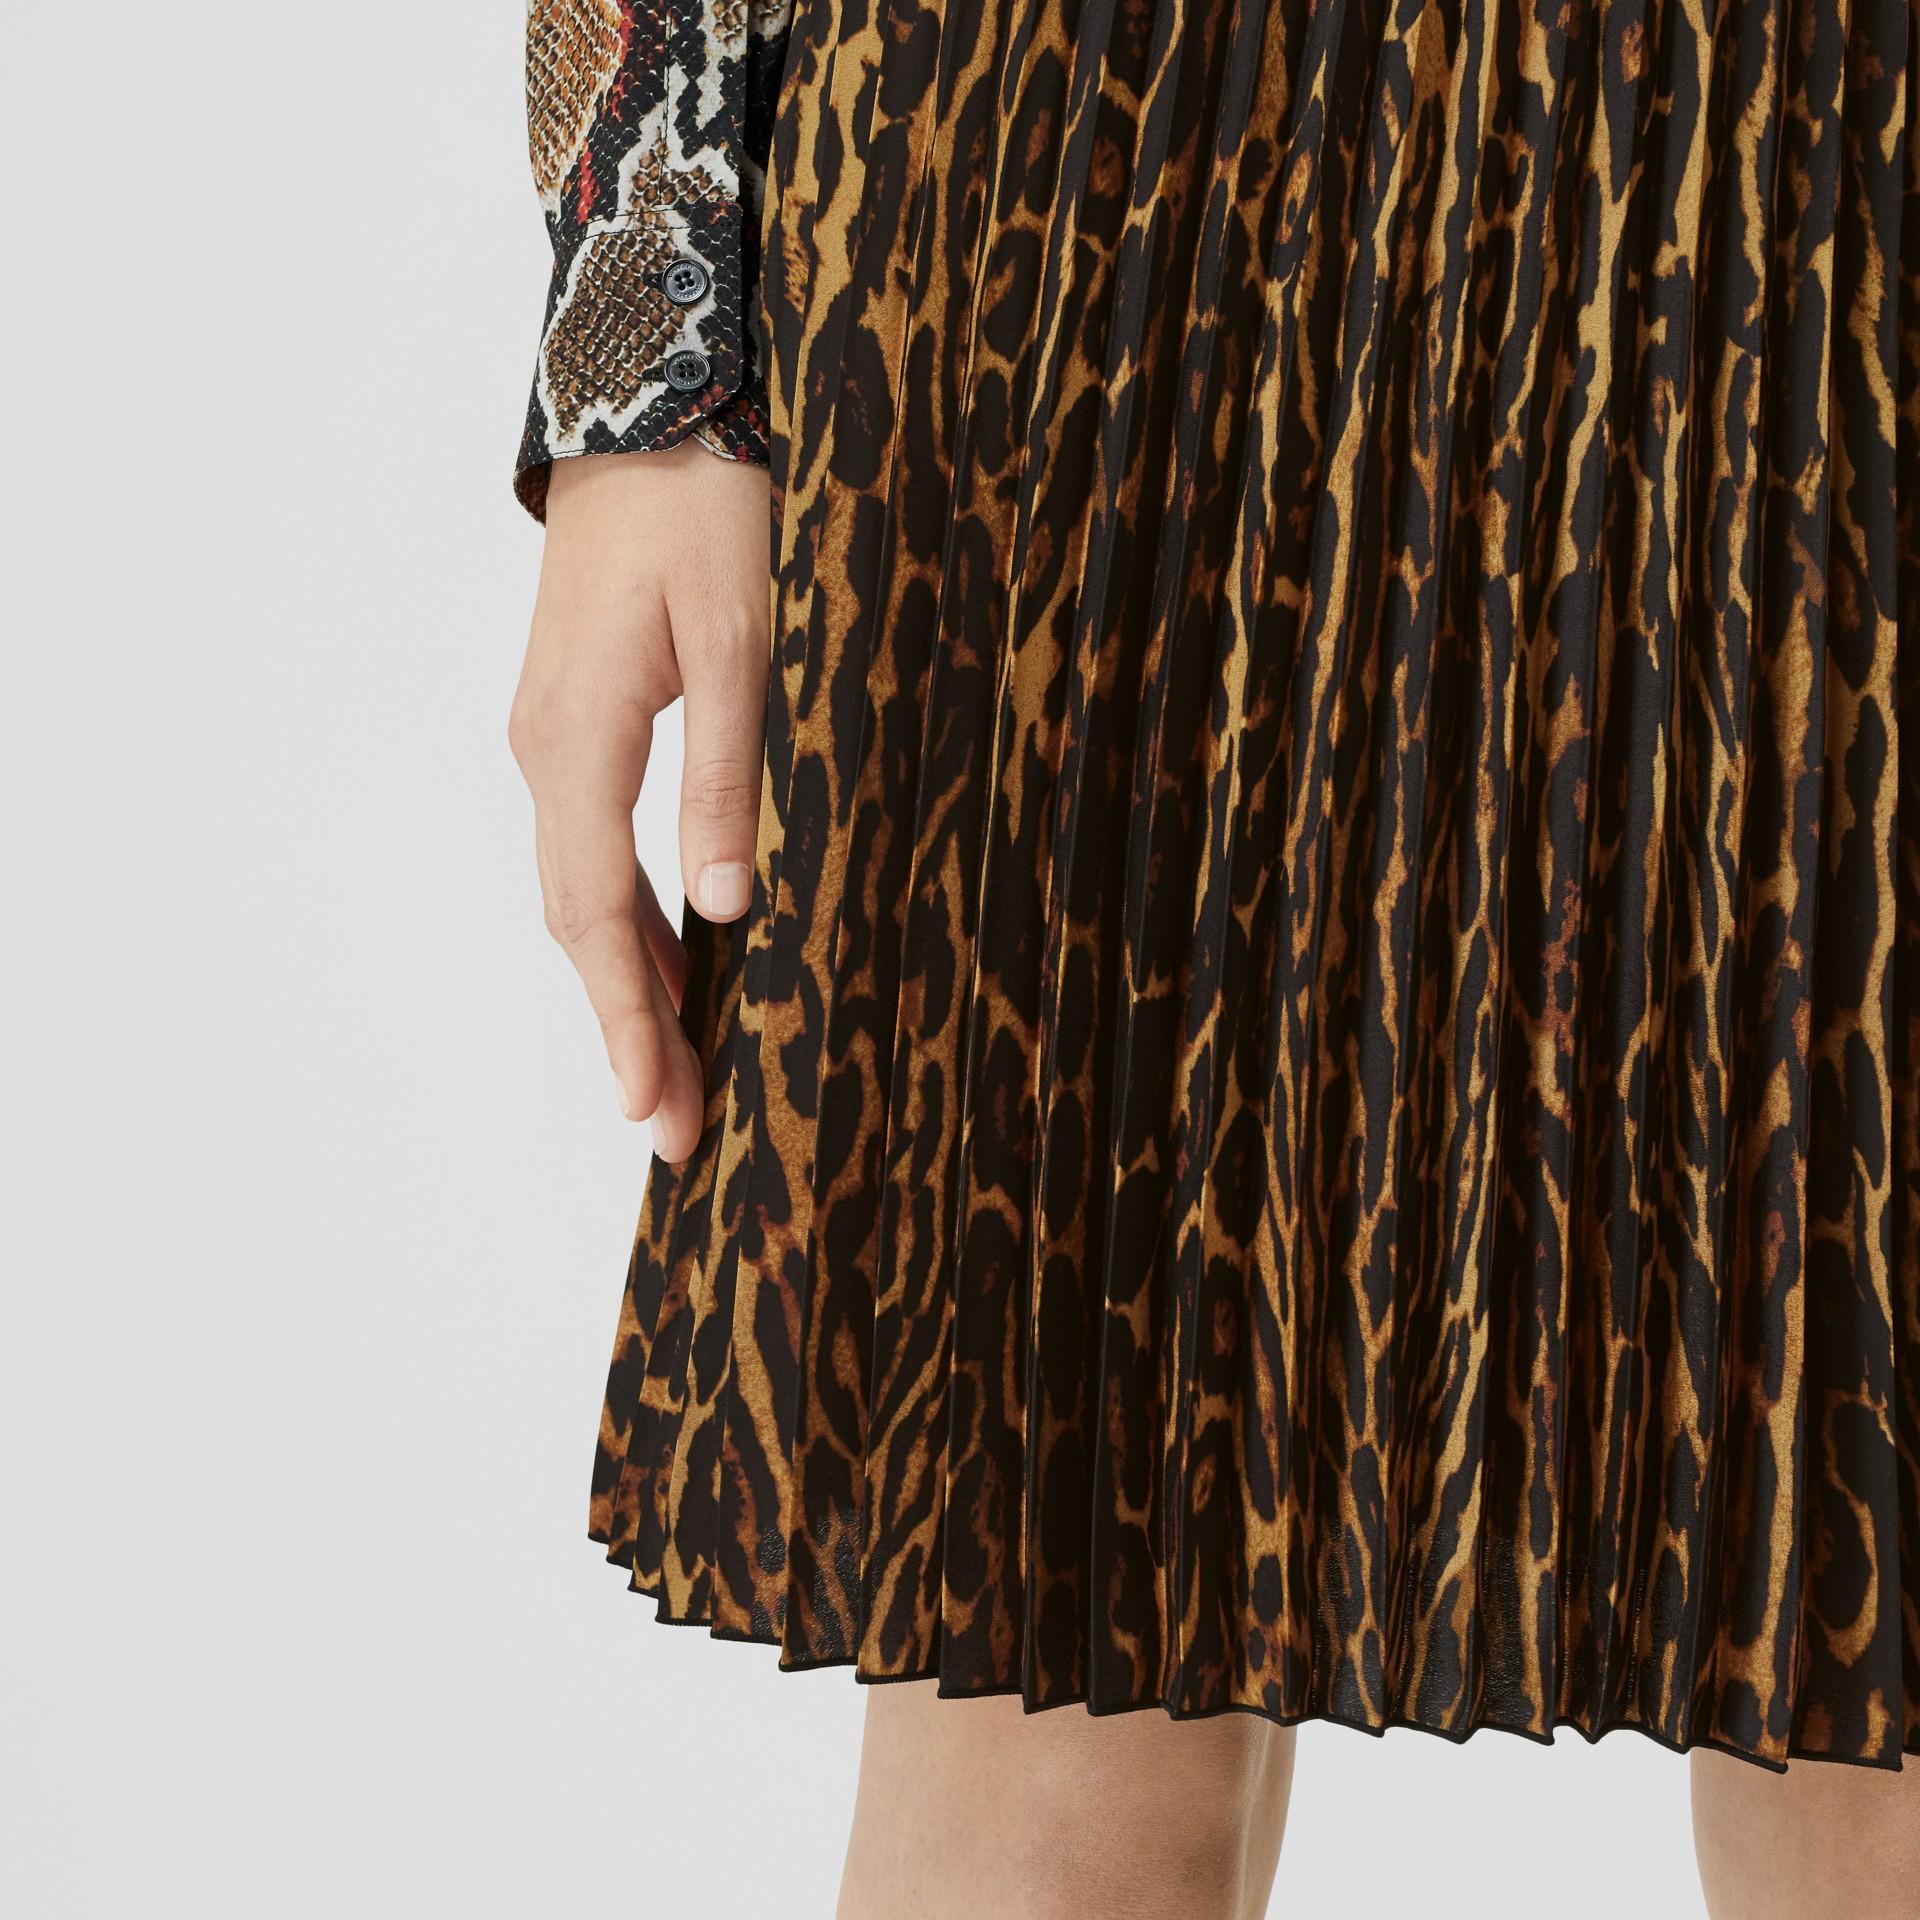 Leopard Print Pleated Skirt in Dark Mustard - Women | Burberry Hong Kong S.A.R - gallery image 1